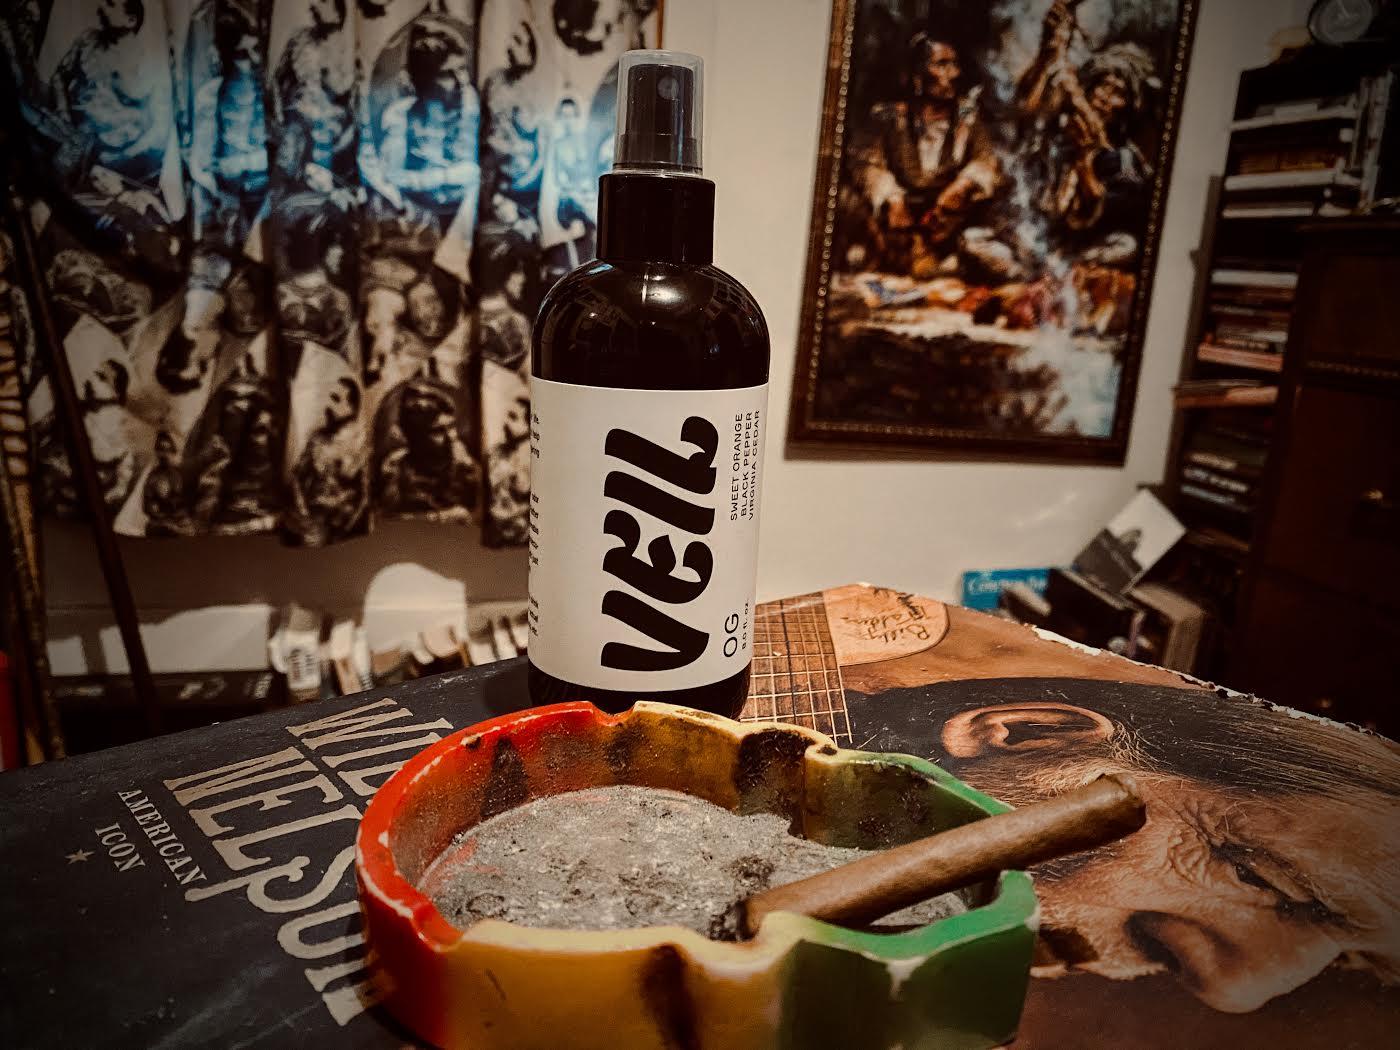 0 - Veil OG Room Spray Smells Lovely, But Can It Handle the Dank?